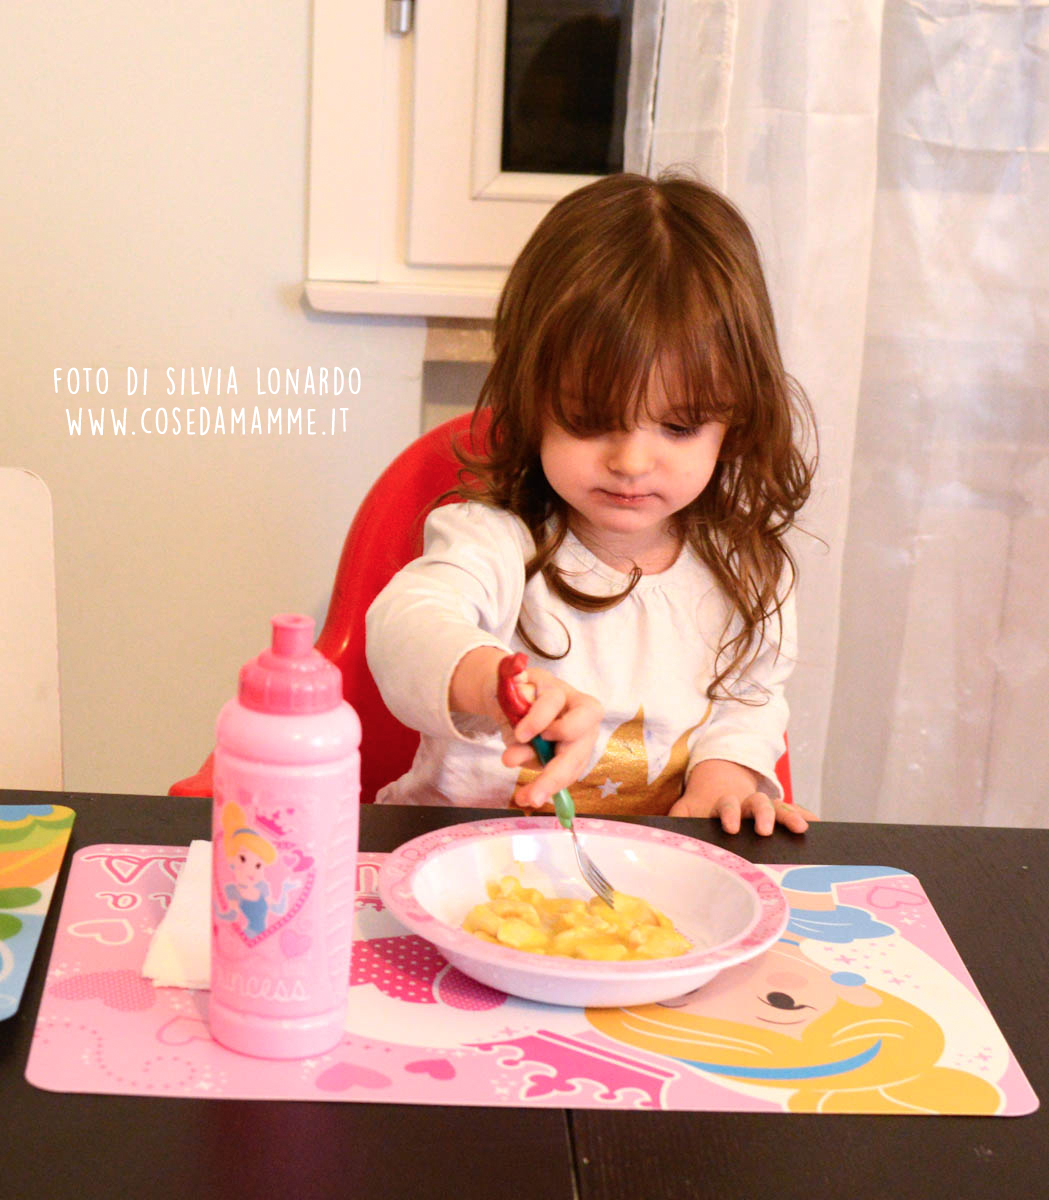 alyssa mangia pollo arancia